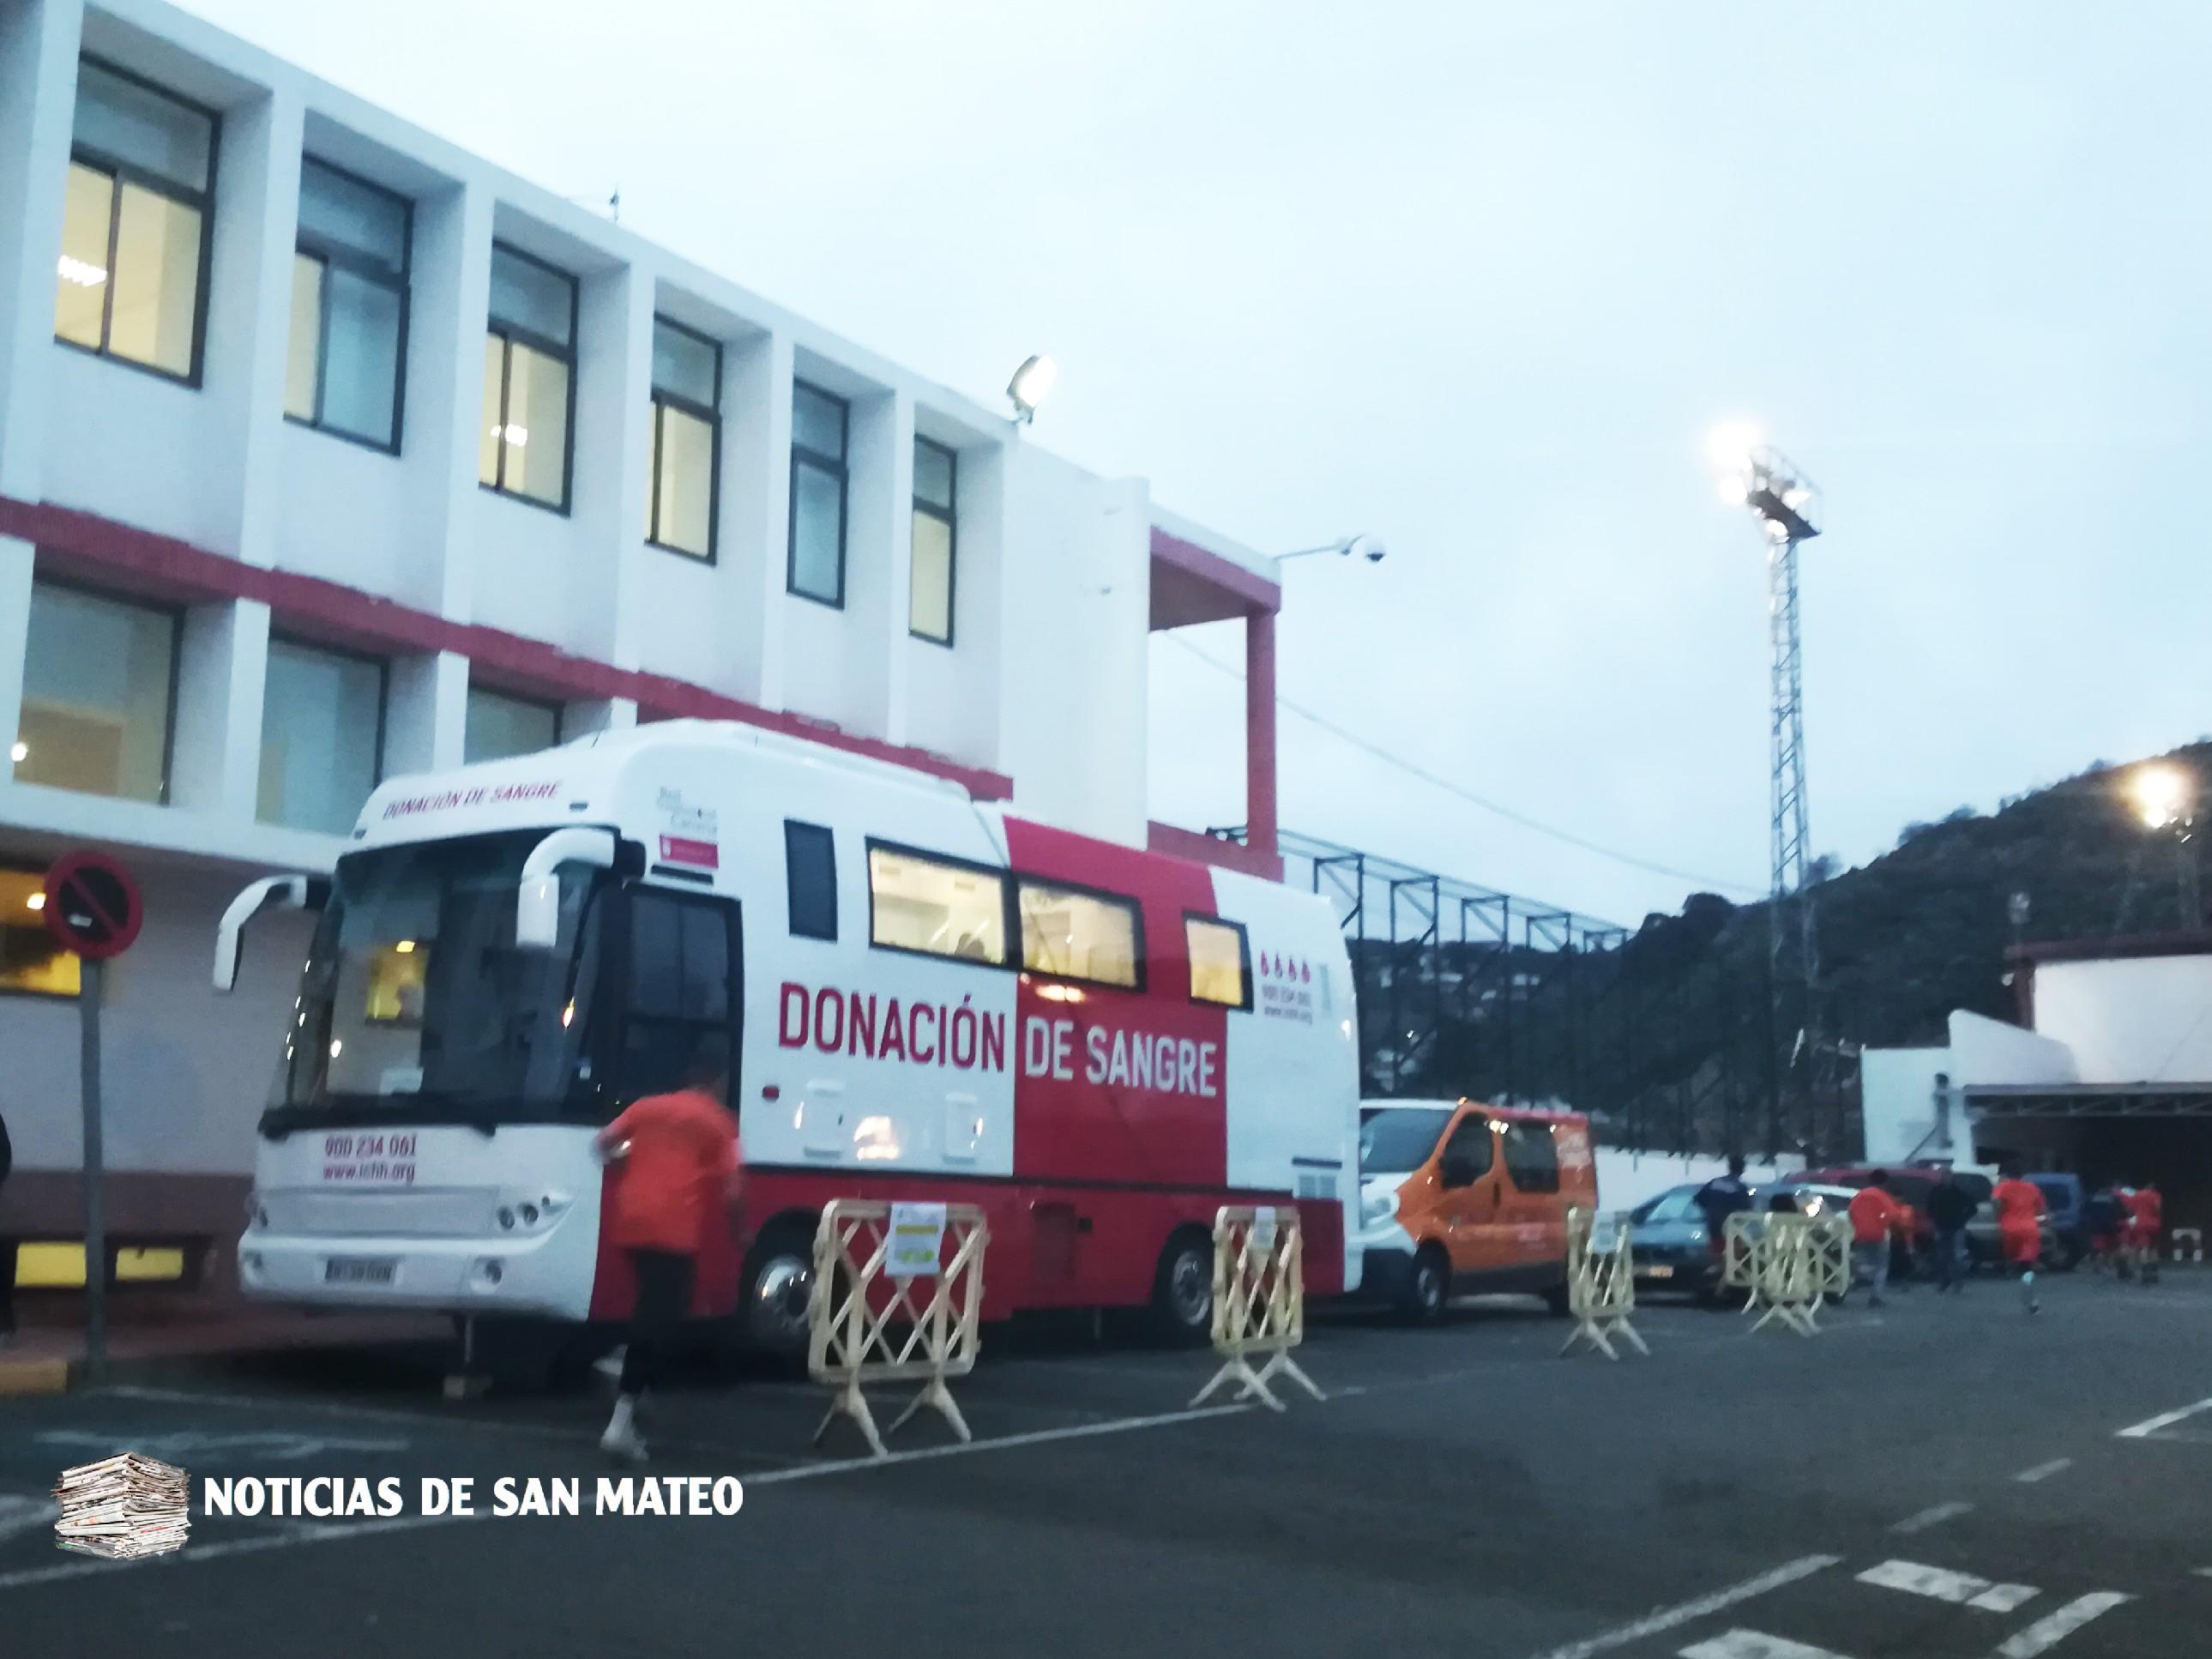 Guagua donacion sangre San Mateo febrero 2018 Foto Laura Miranda Noticias de San Mateo